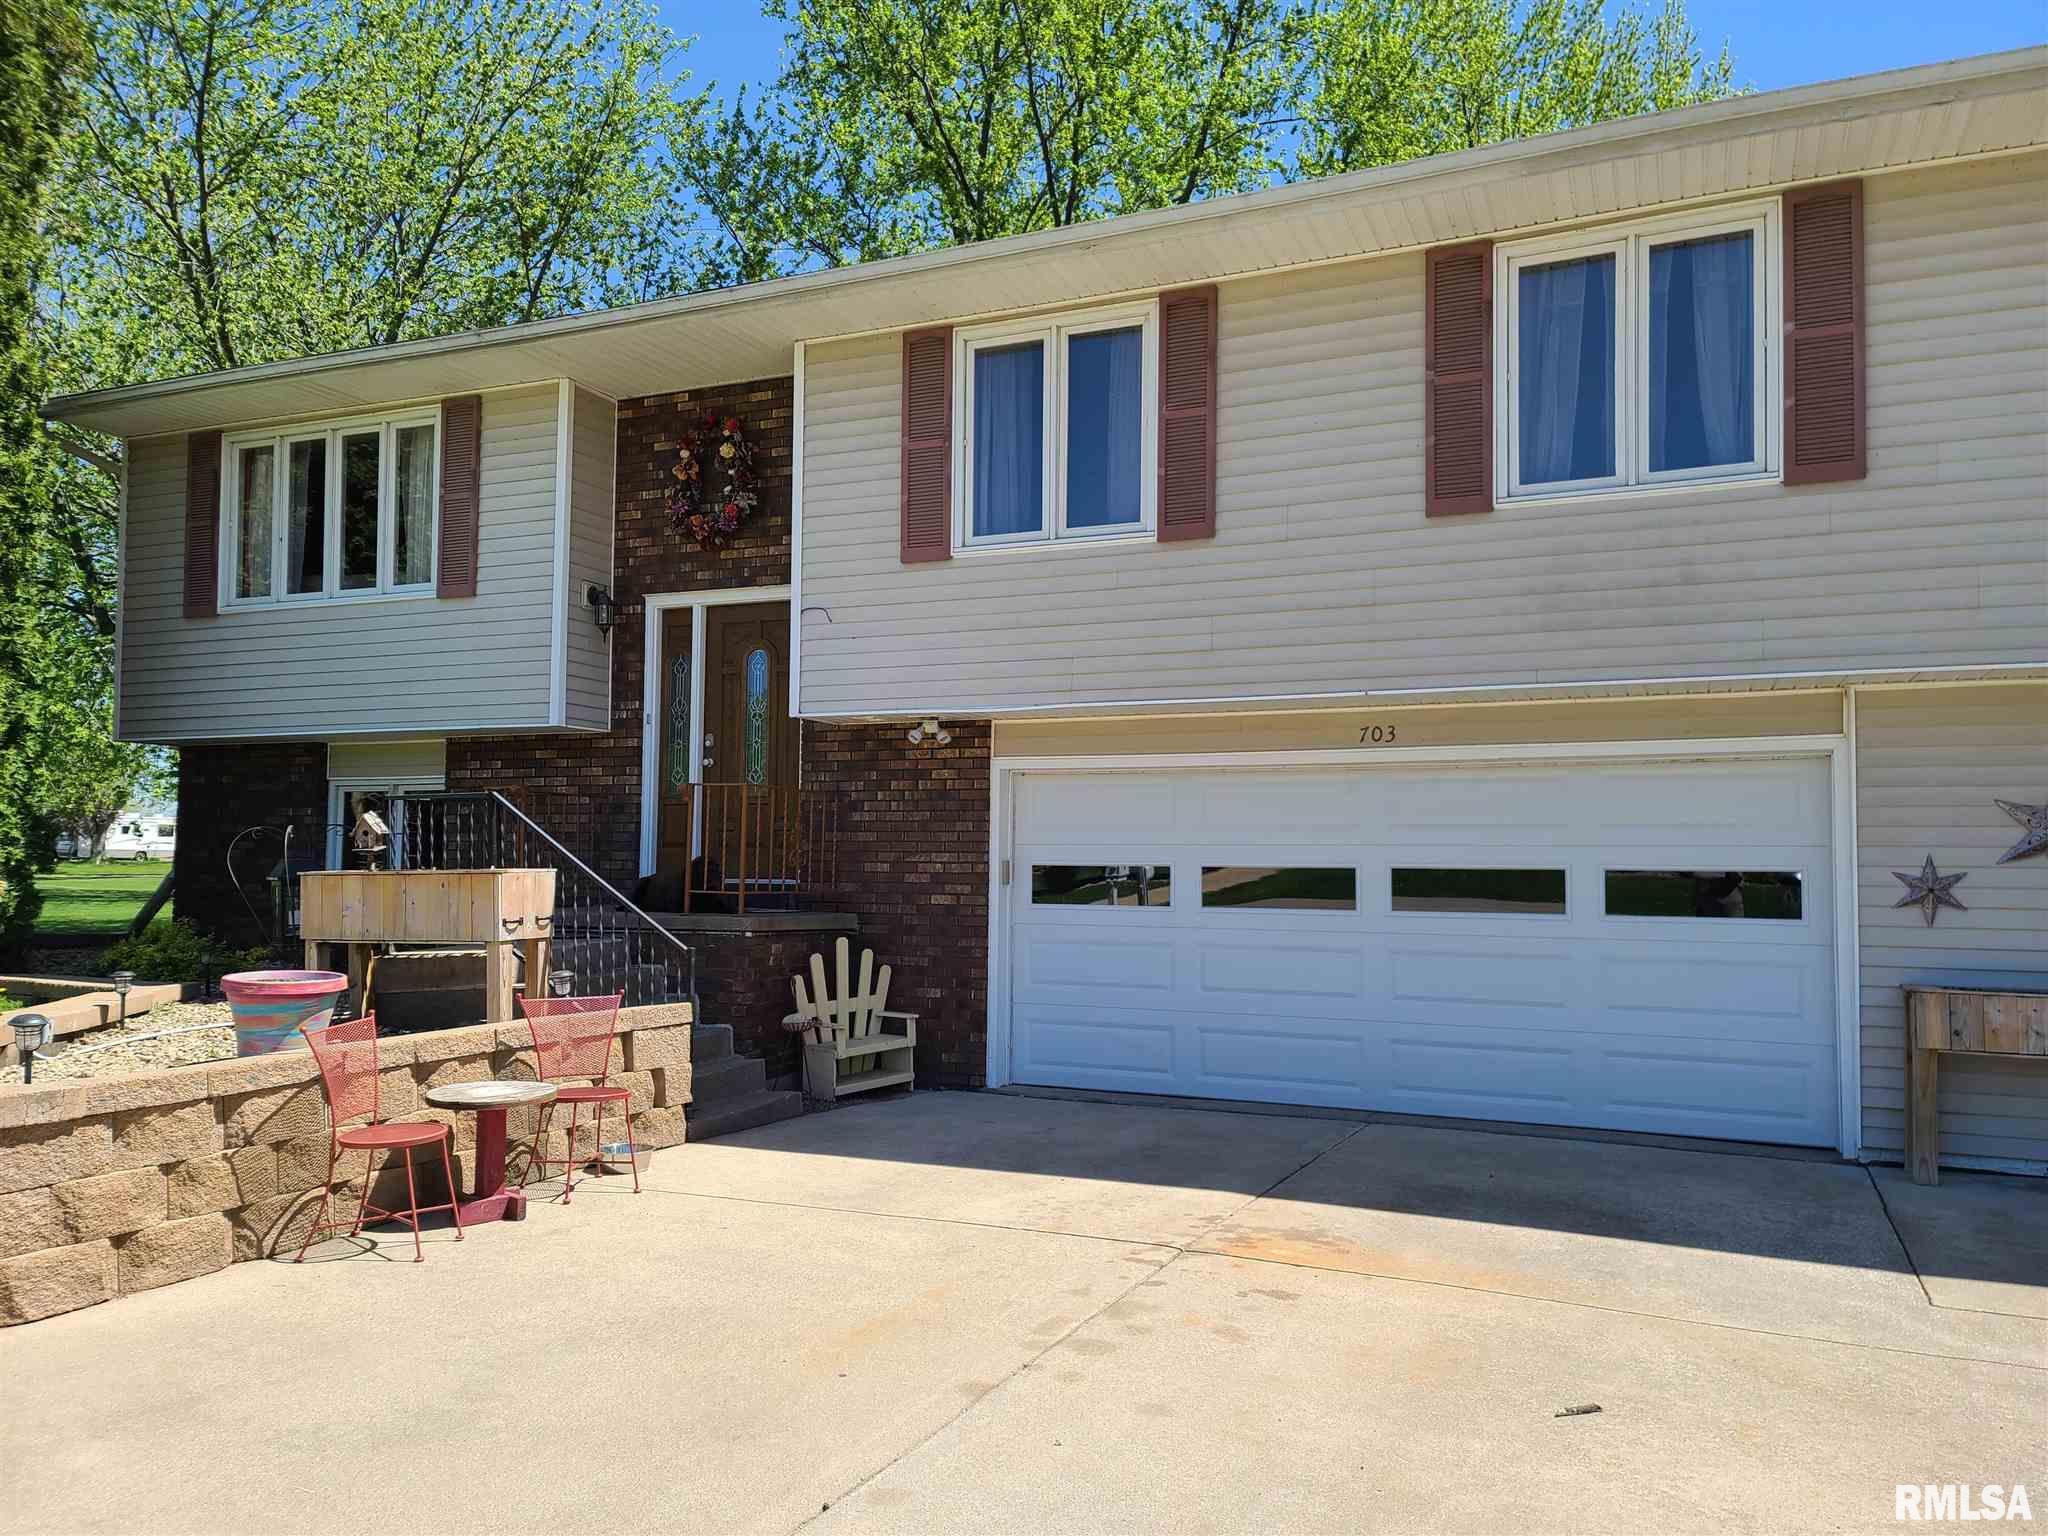 703 RIDGE Property Photo - Albany, IL real estate listing